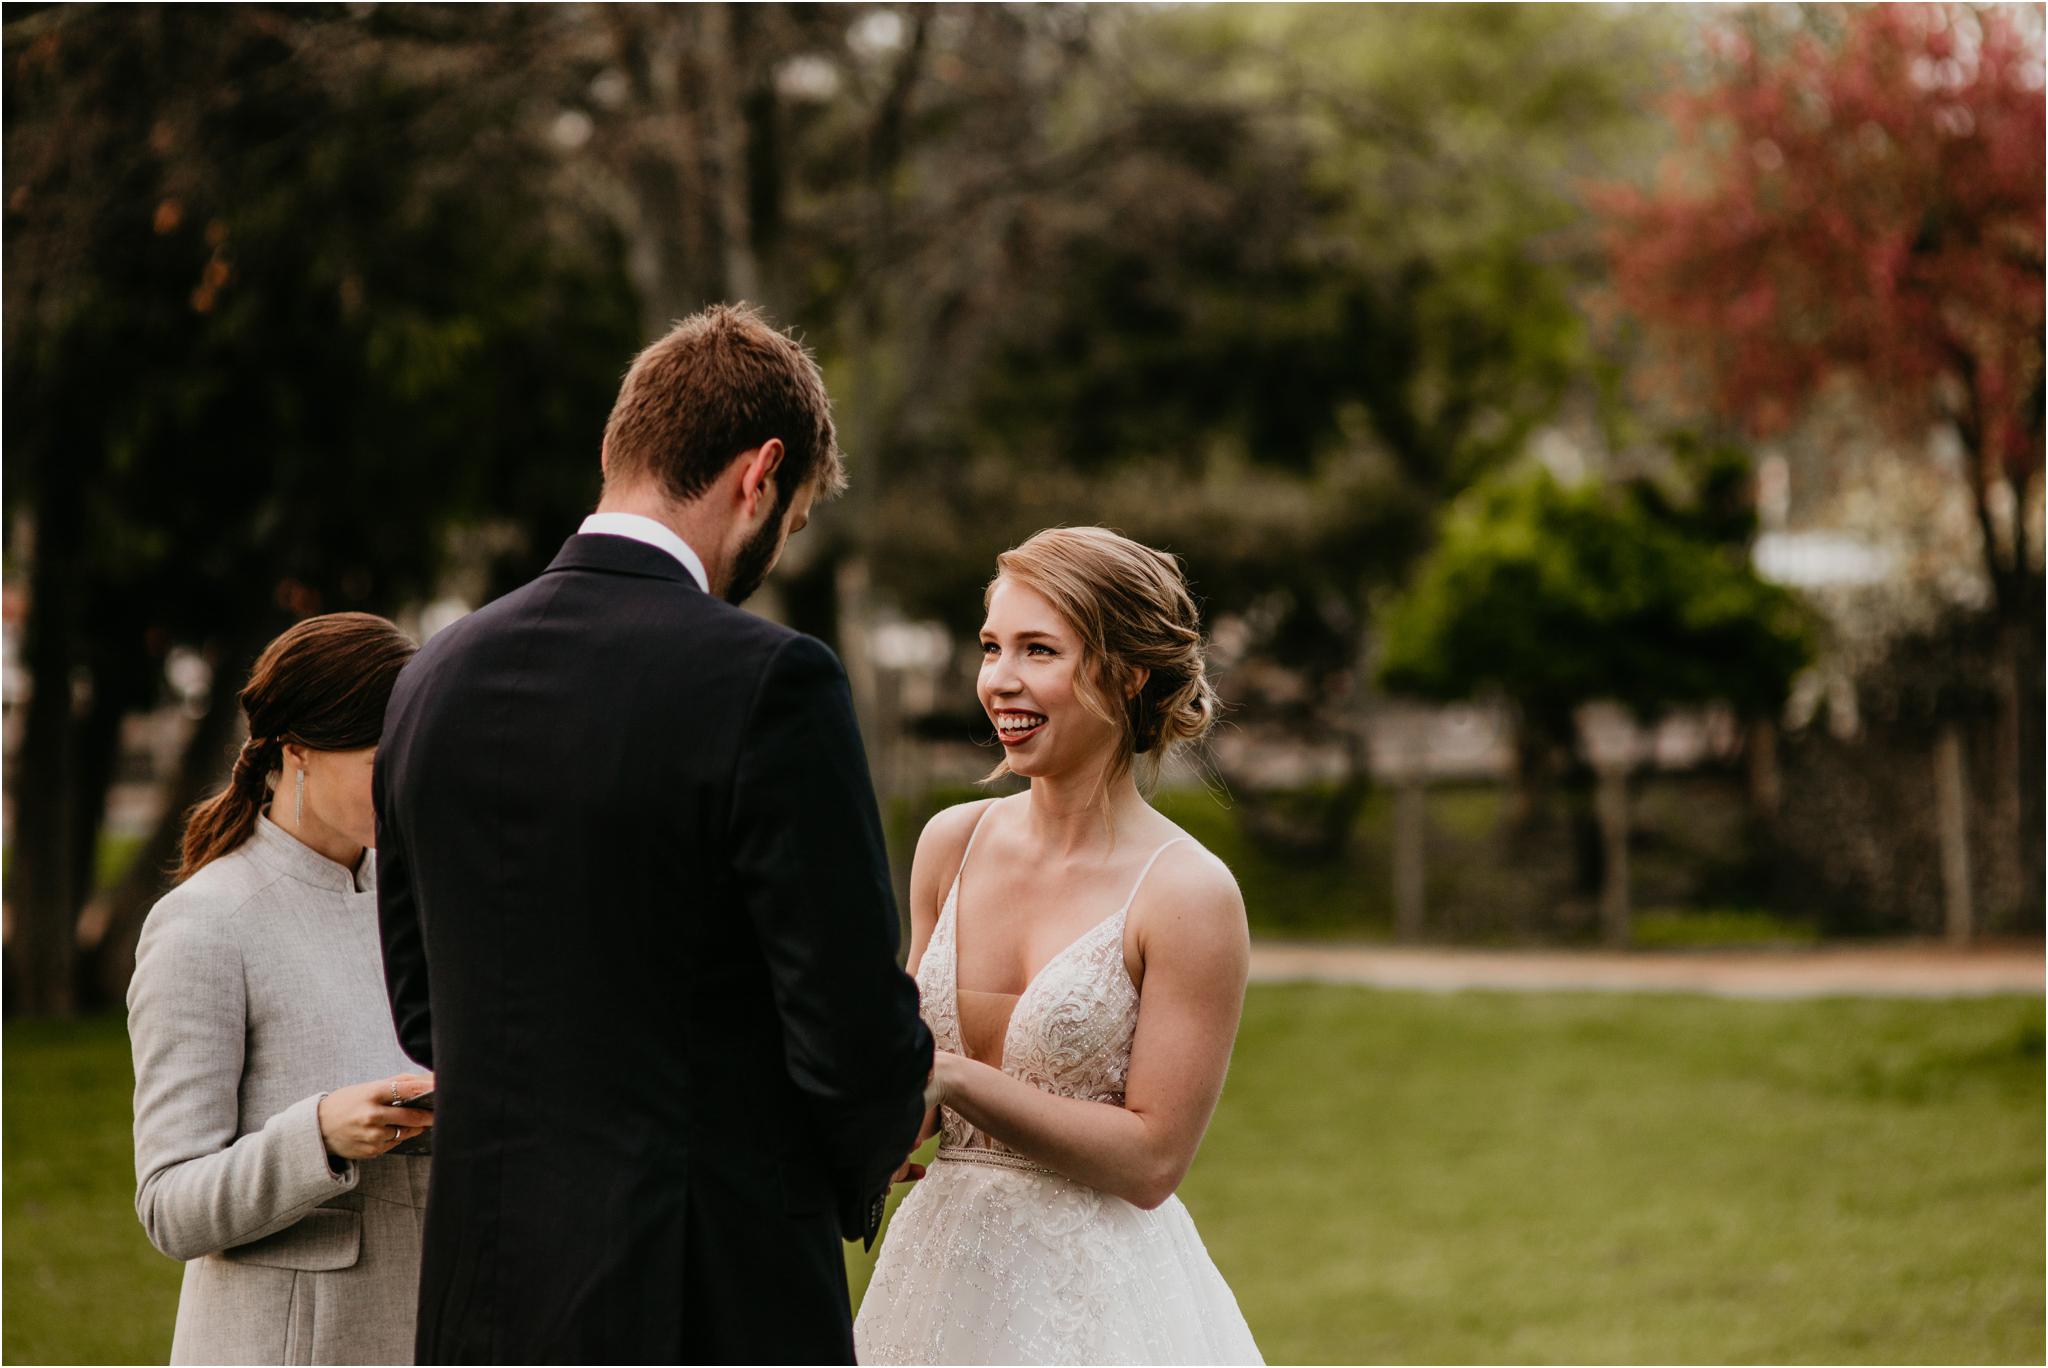 miranda-and-jared-paris-elopement-destination-wedding-photographer-033.jpg